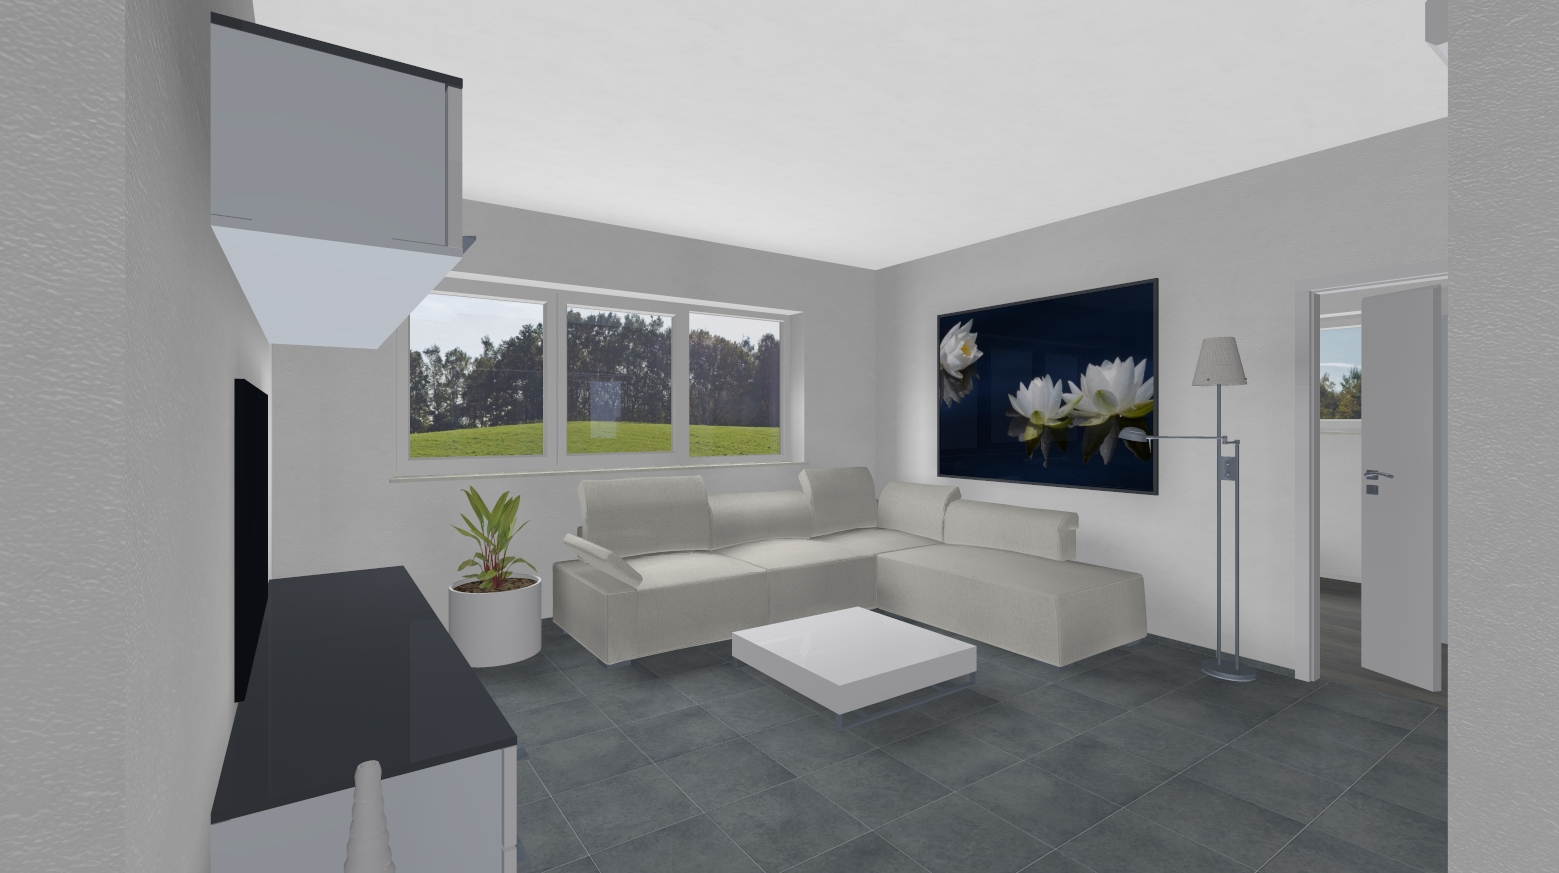 3 D Visualisierung | Bauvorhaben artos-haus.de Bild 2